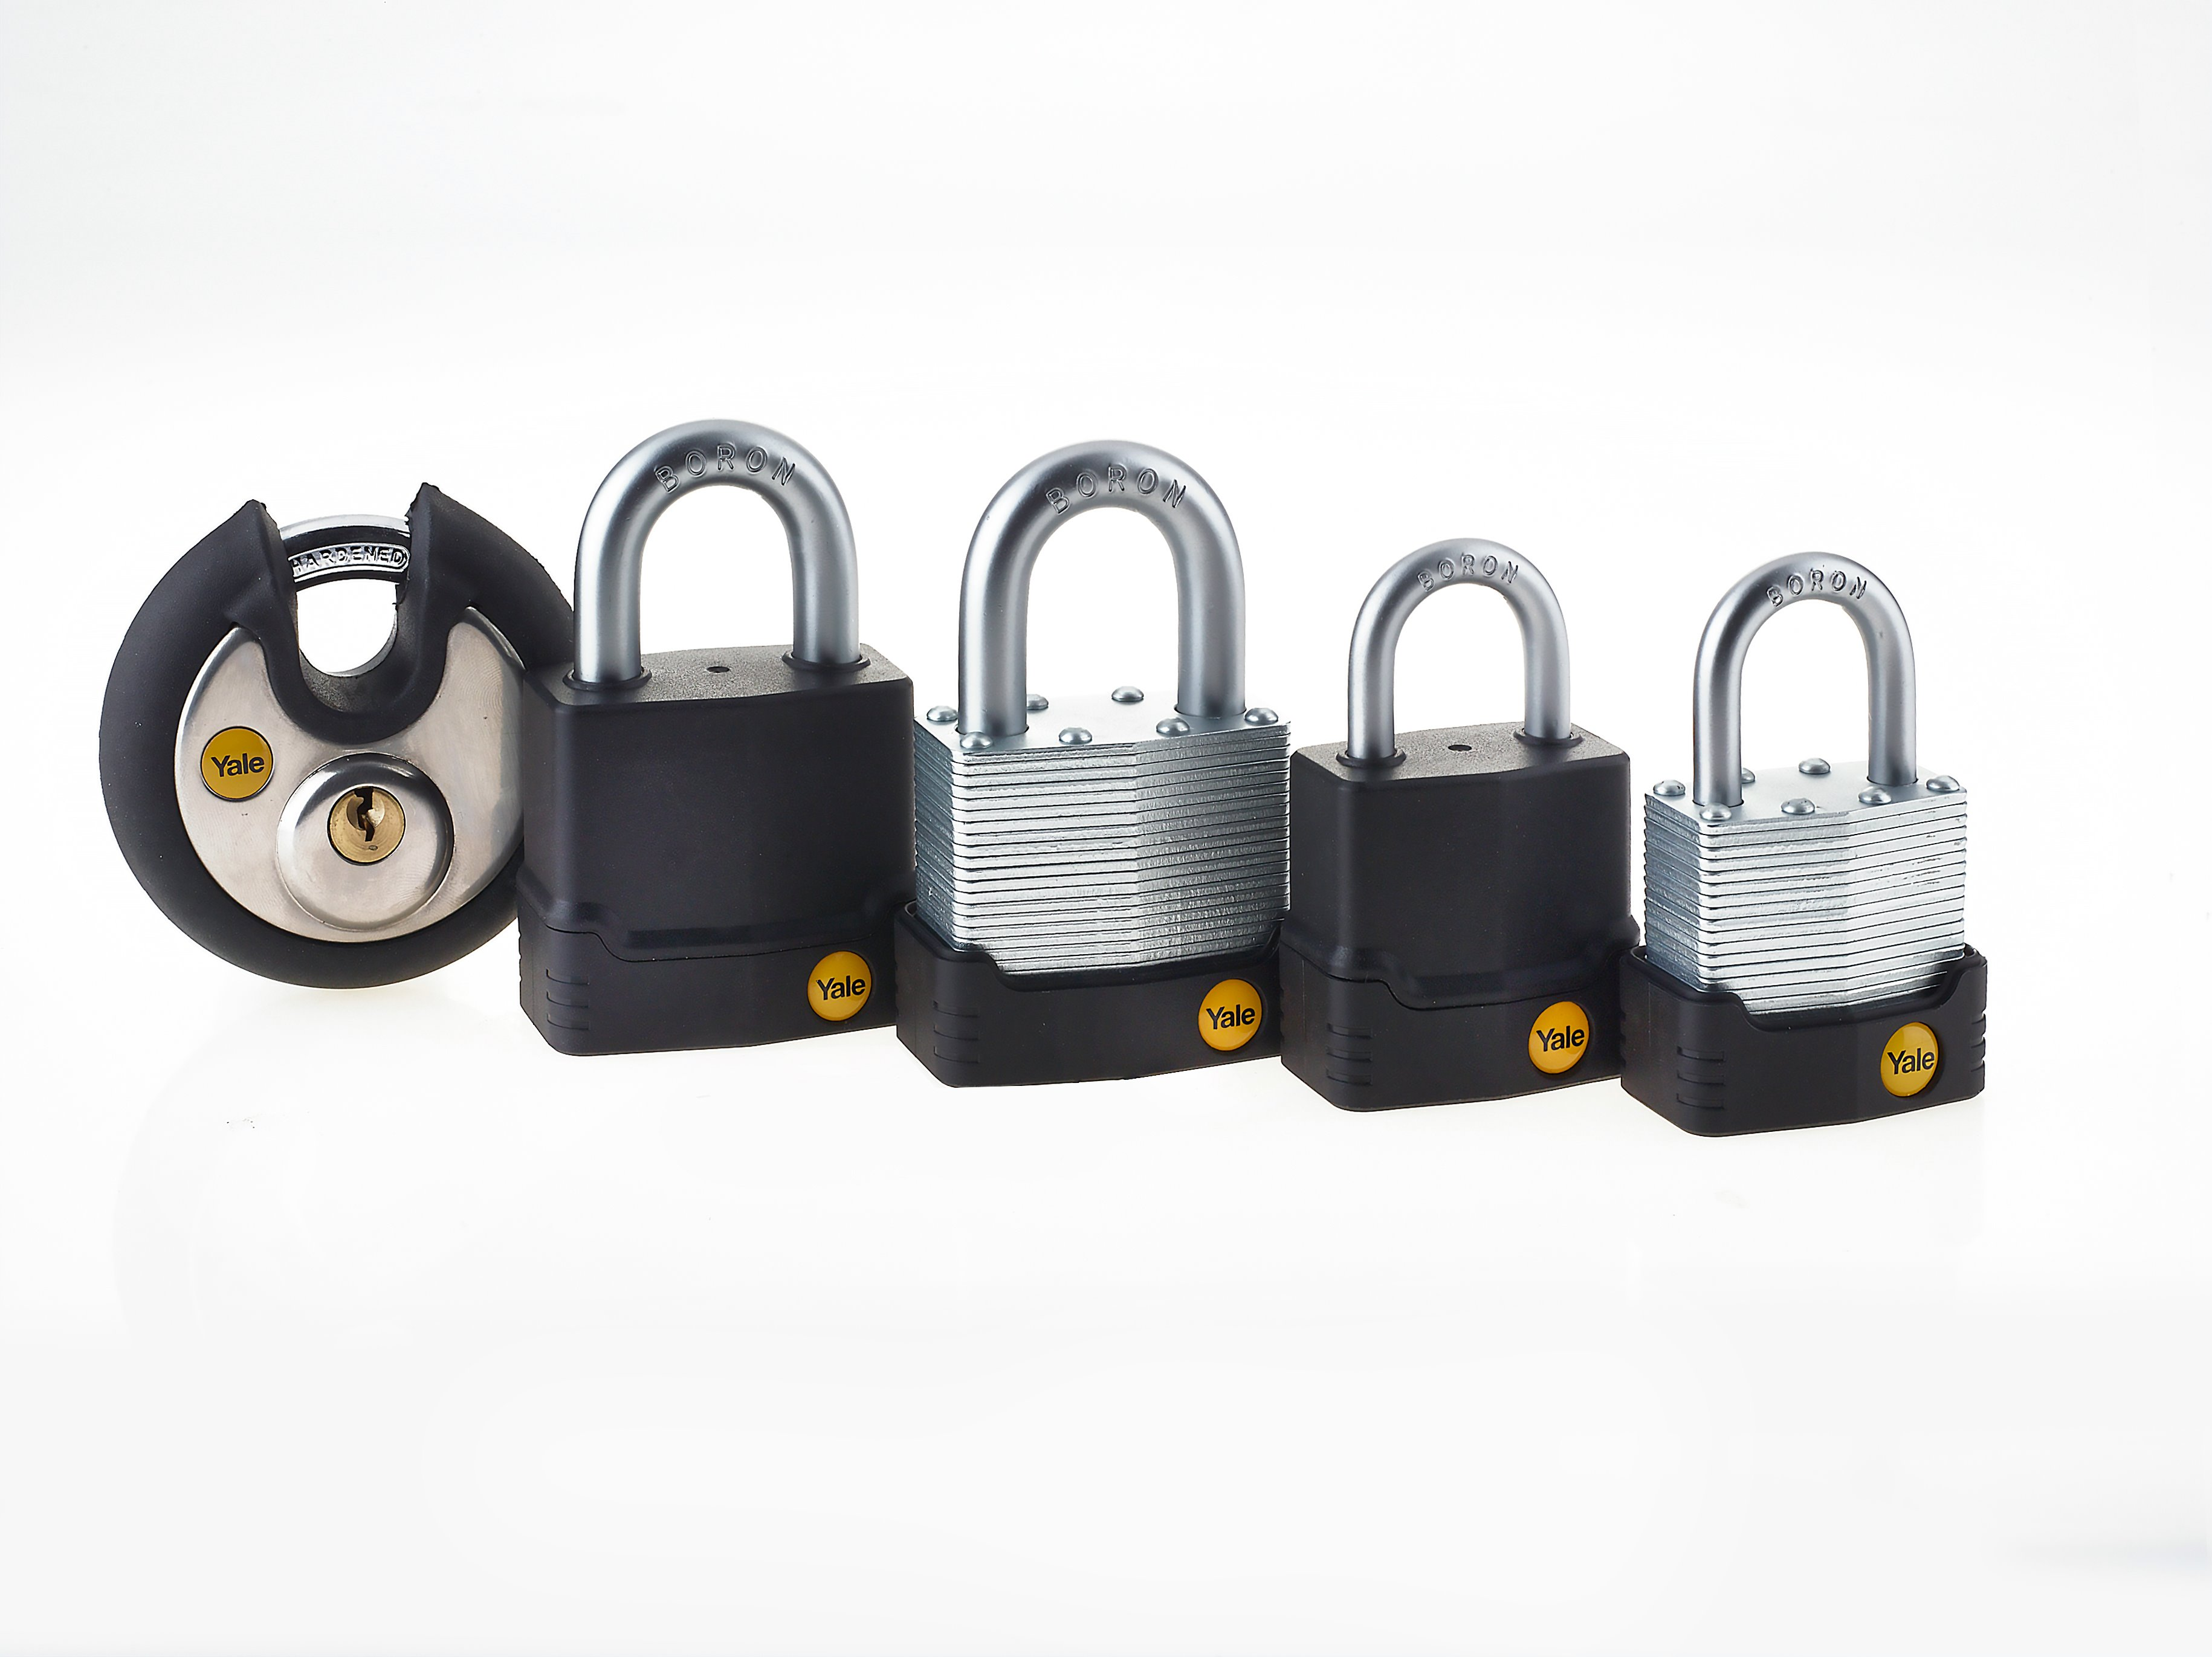 Protector range